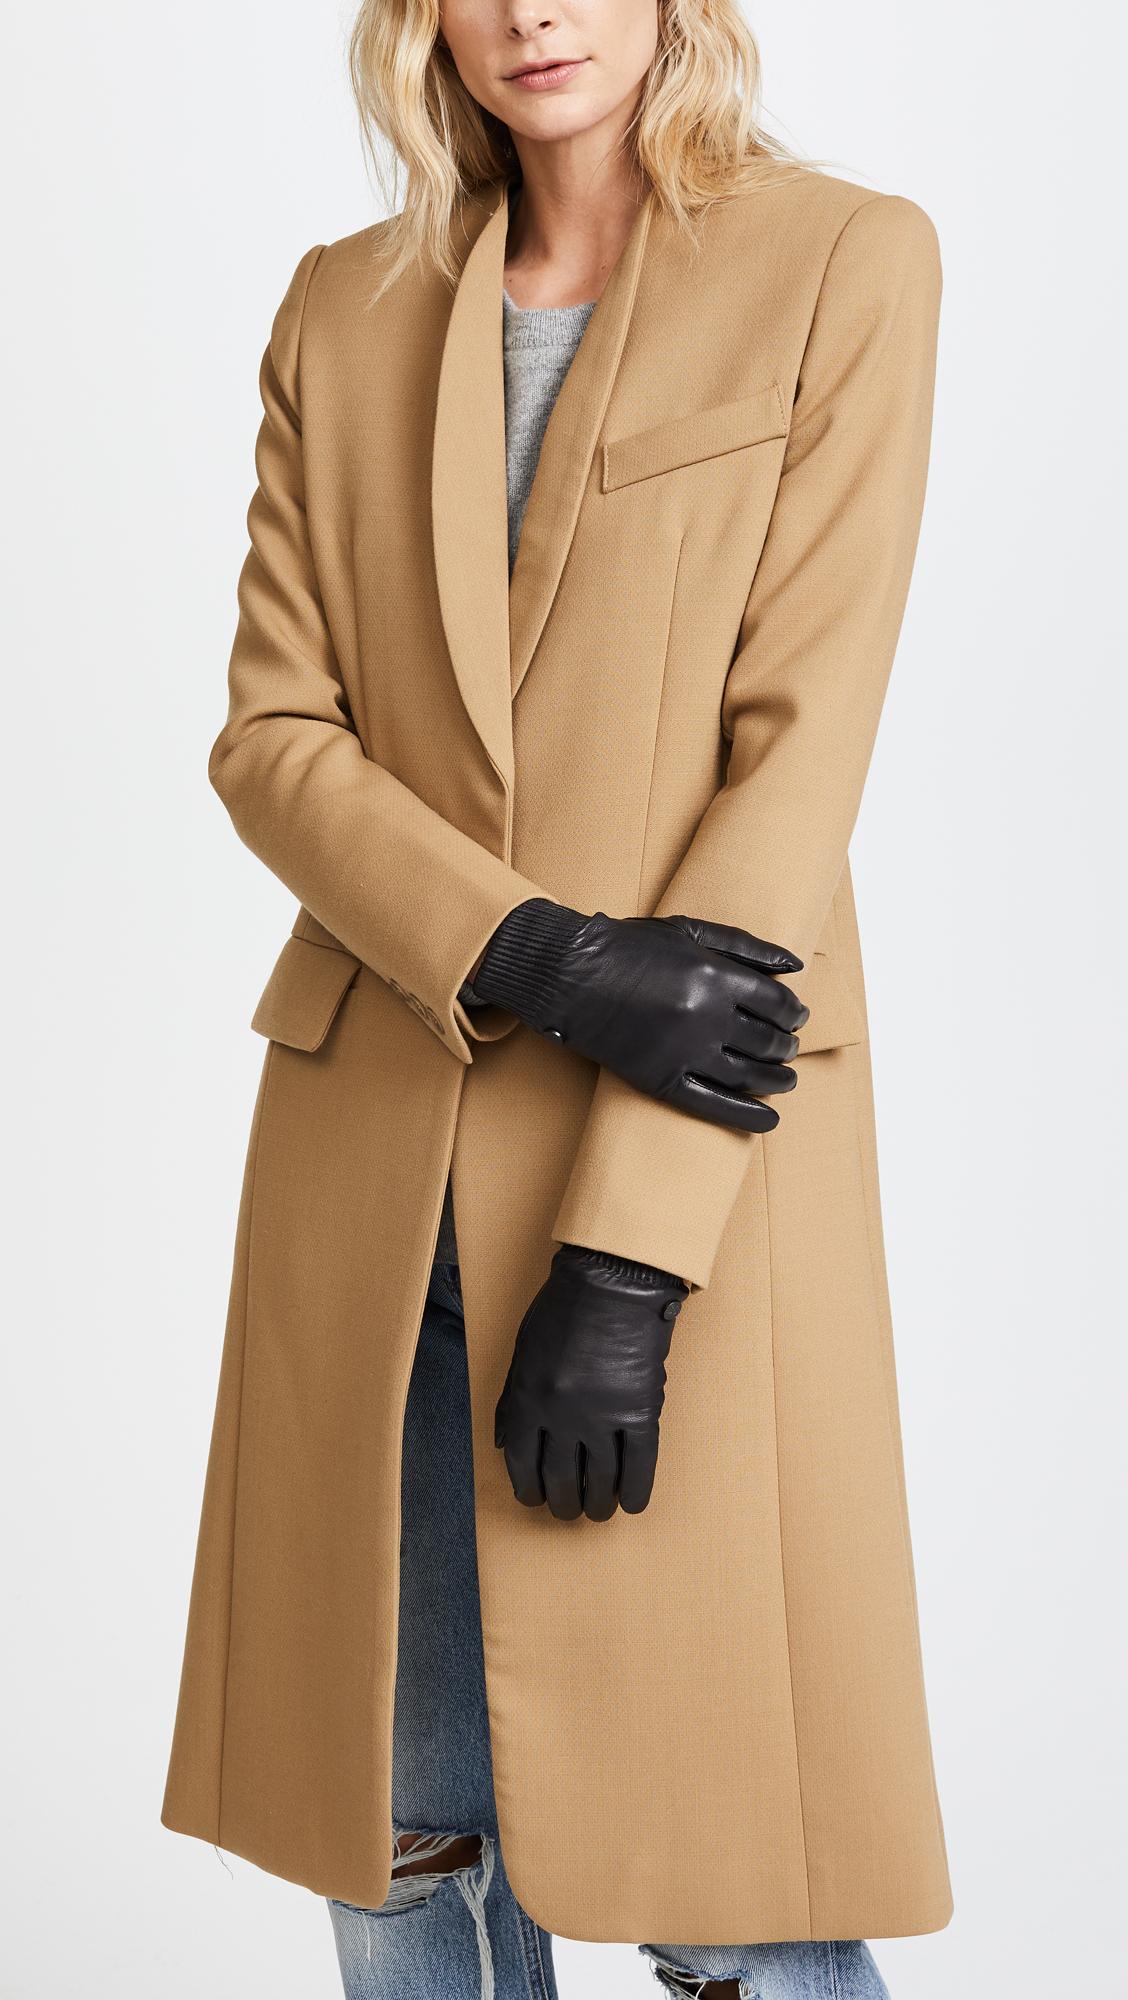 bd7dcd2b43de Canada Goose Leather Rib Tech Gloves